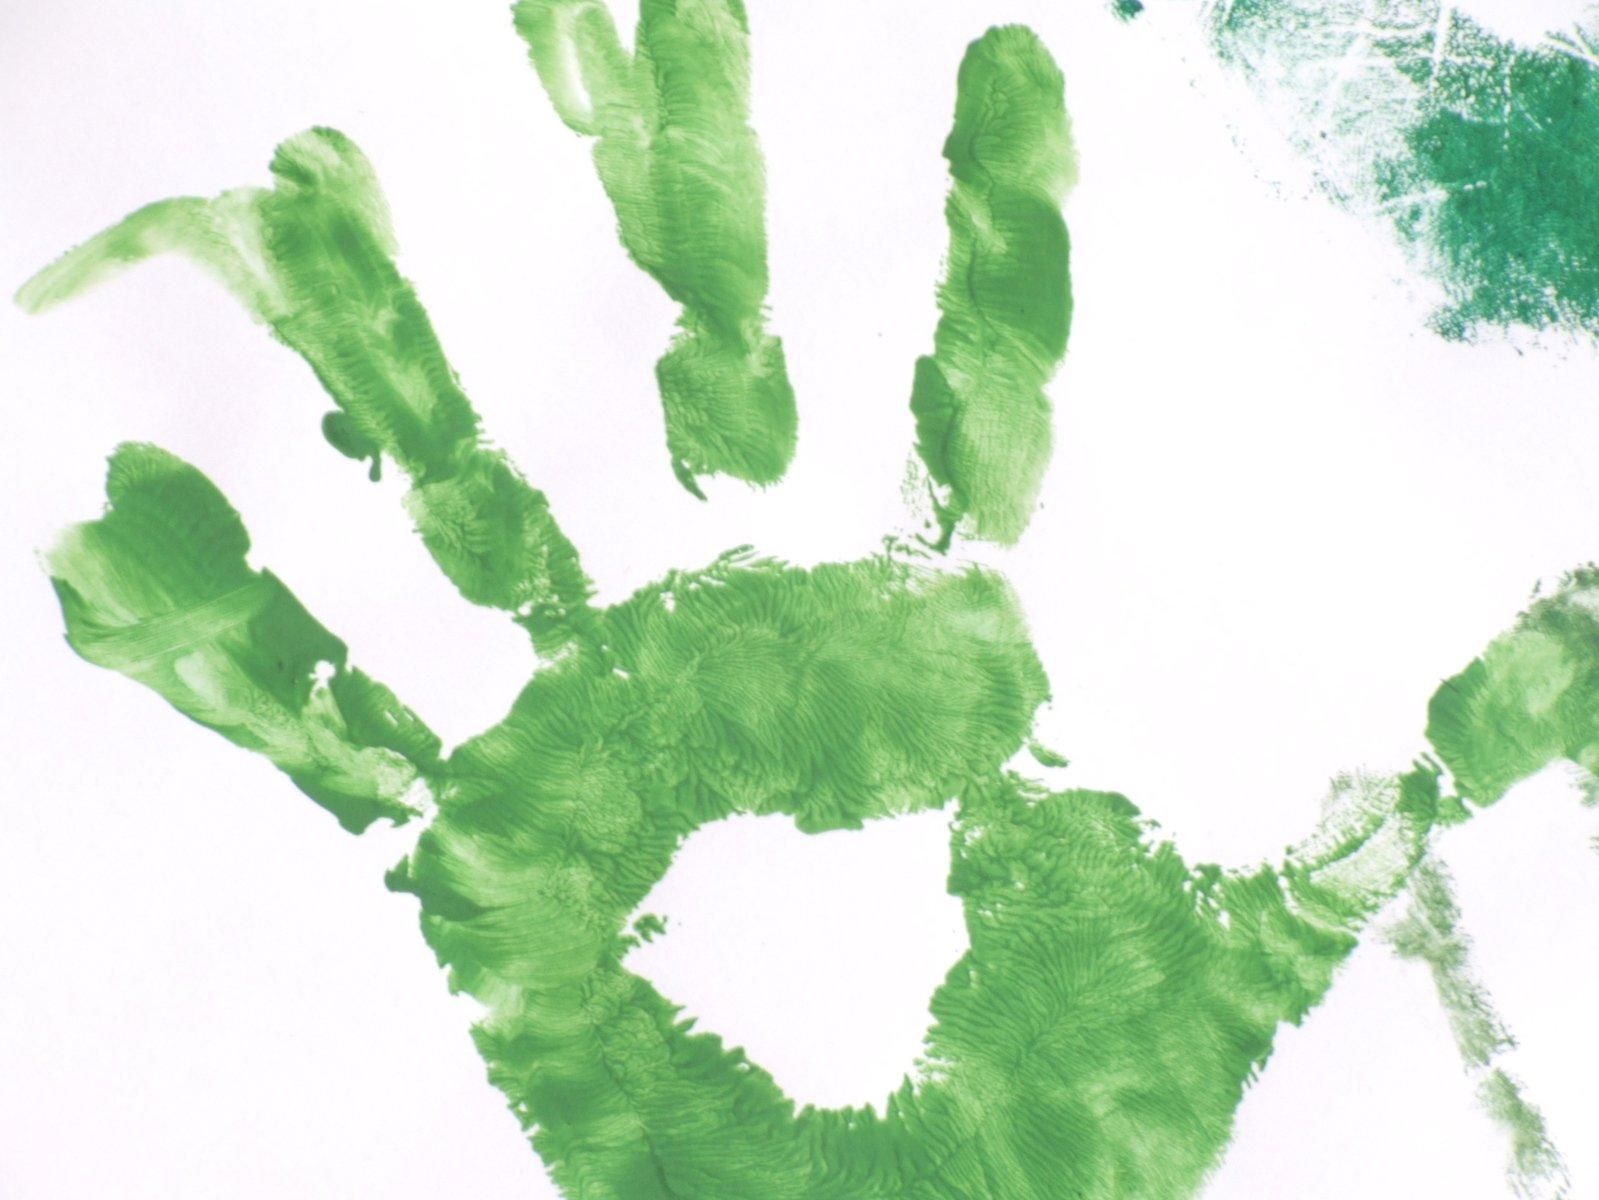 тут зеленая рука картинки одному внешнему виду